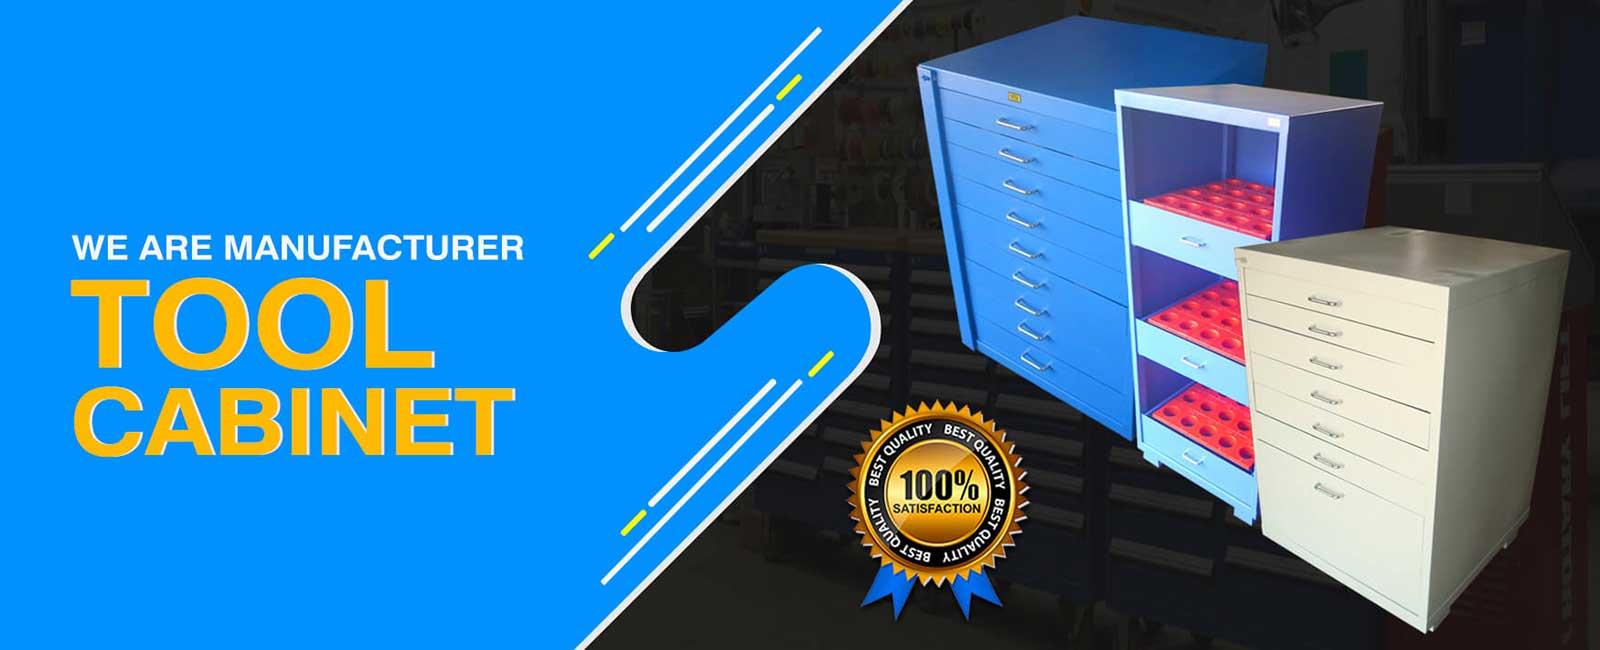 Tool Cabinet Manufacturer